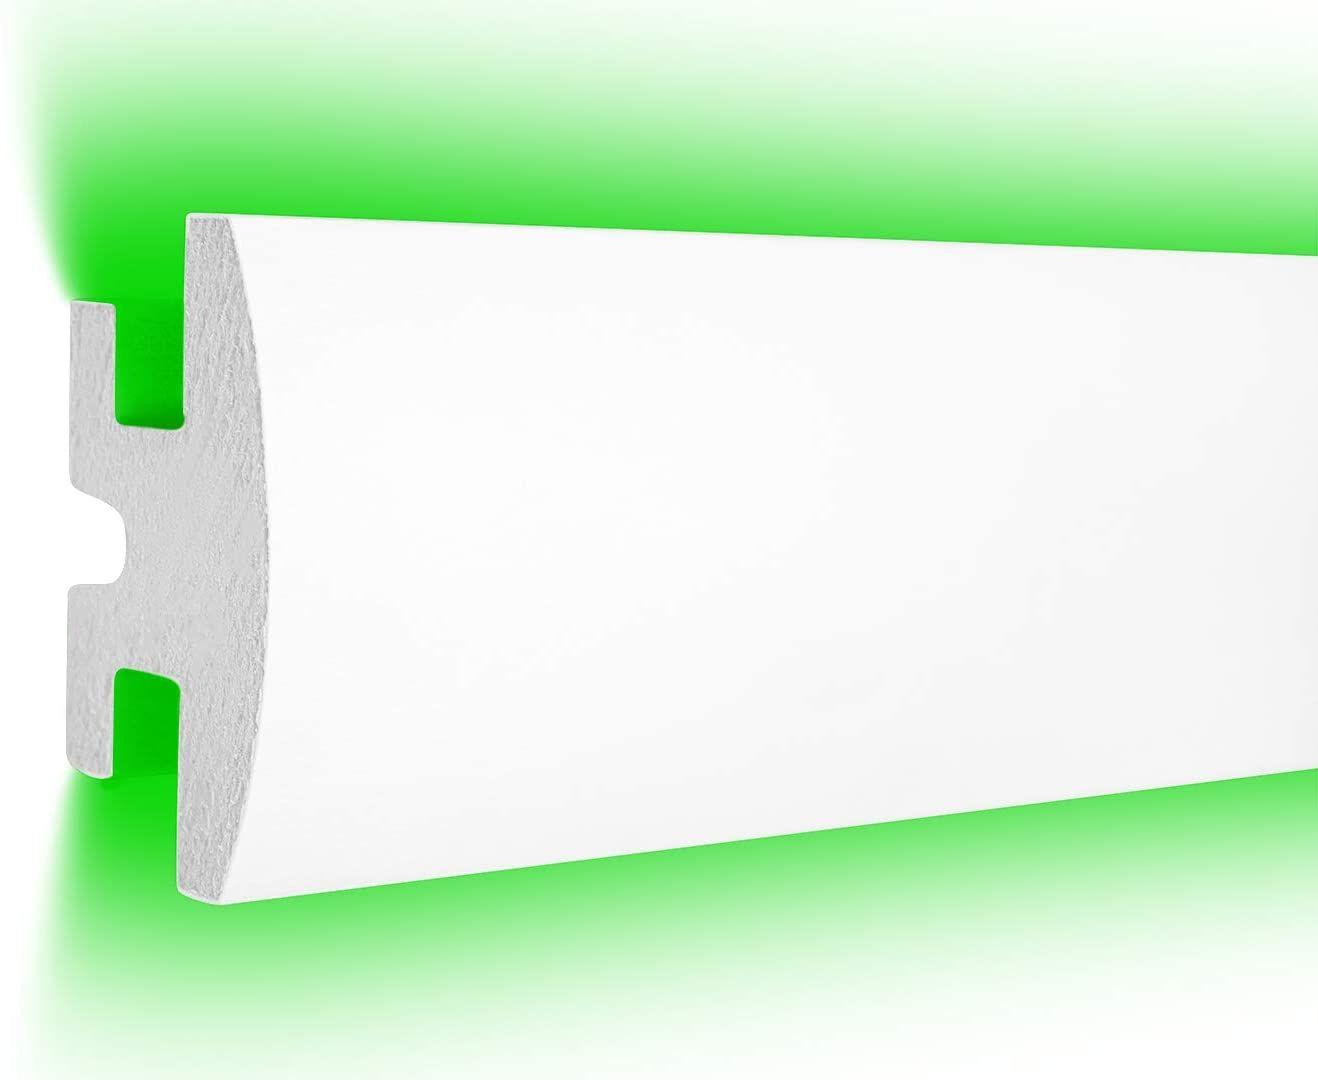 Led Trockenbau Profil Fur Indirekte Beleuchtung 1 15 M 90x50mm Rigips Xps Lichtvoute Leisten Fur Gipspl In 2020 Indirekte Beleuchtung Trockenbau Trockenbau Profile